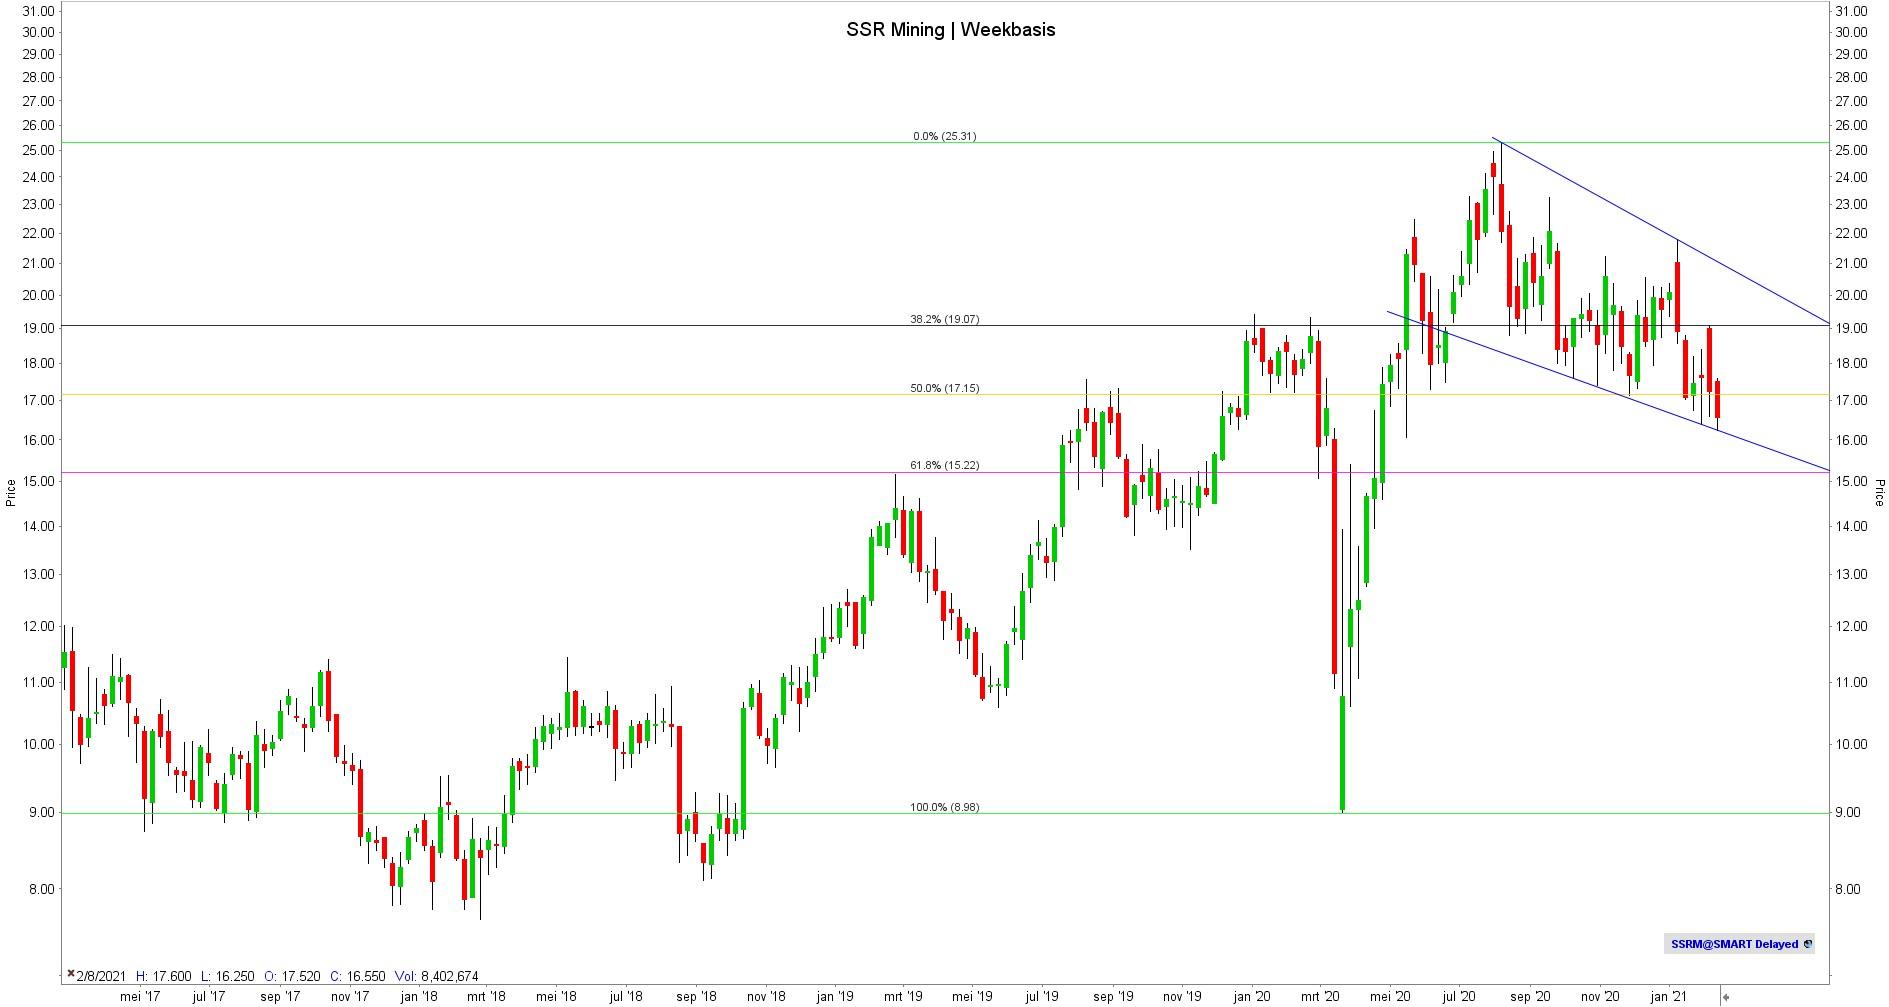 Aandeel SSR mining koers